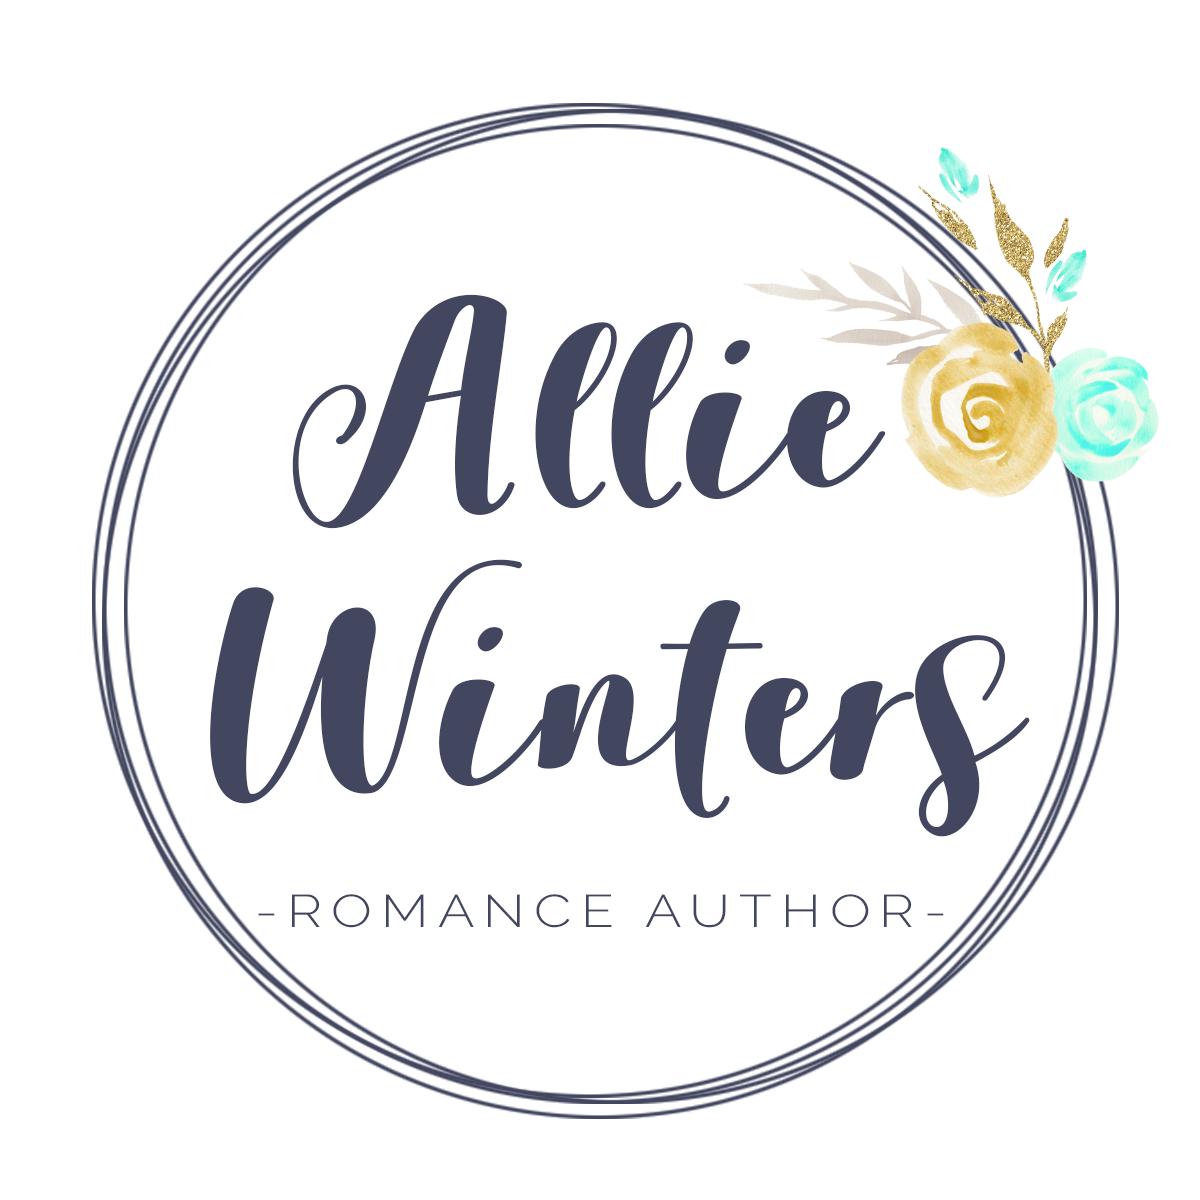 Author of the suncoast university new adult romance series -